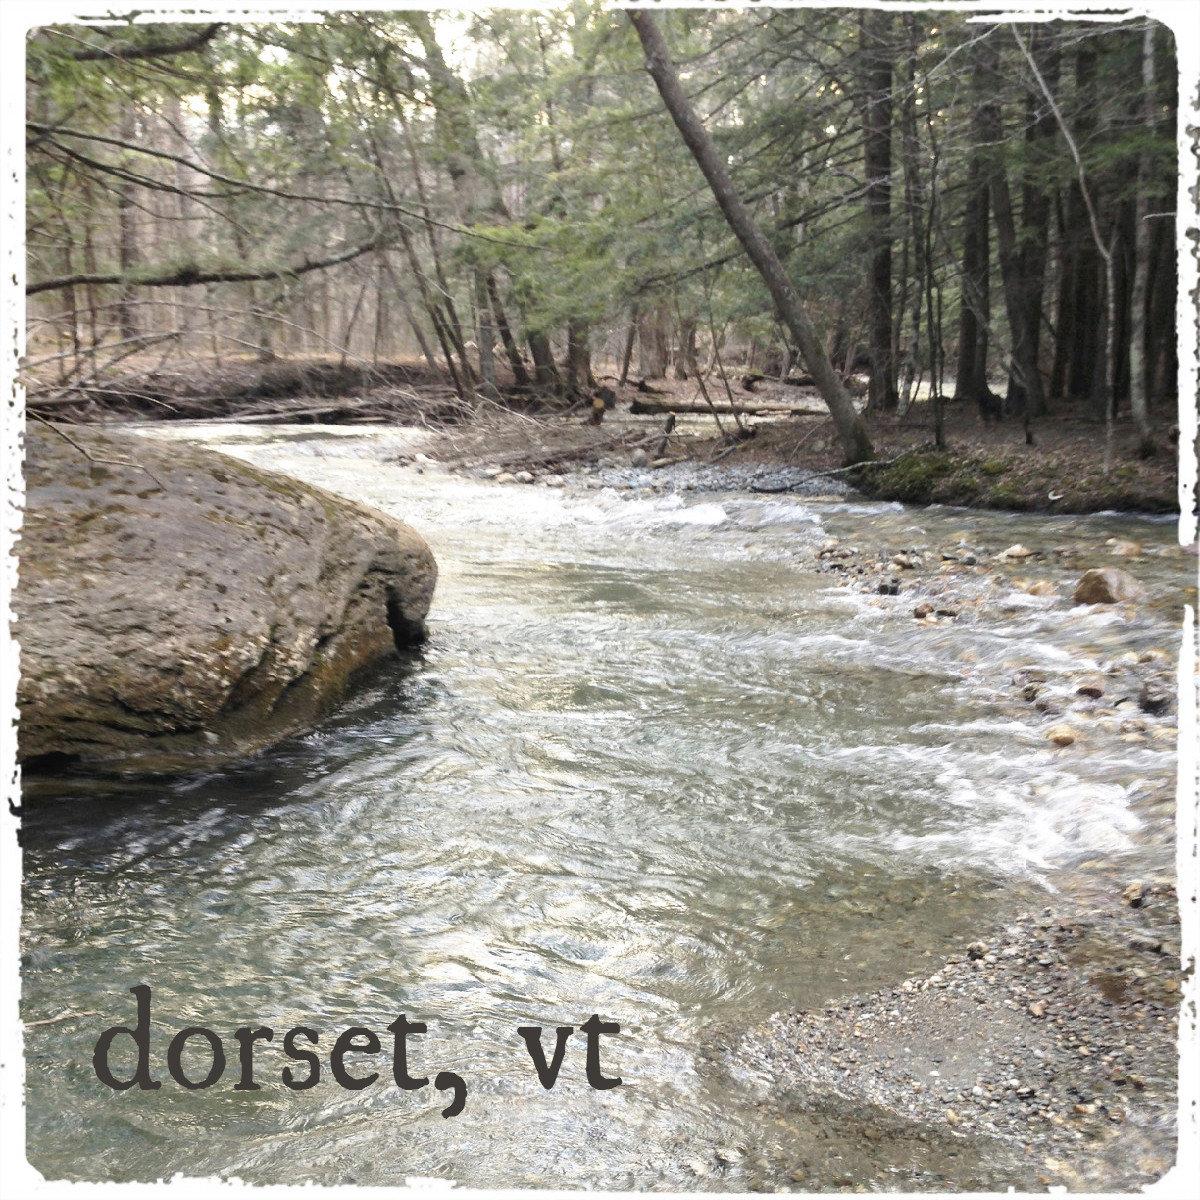 Dorset, VT by Kayla Ringelheim